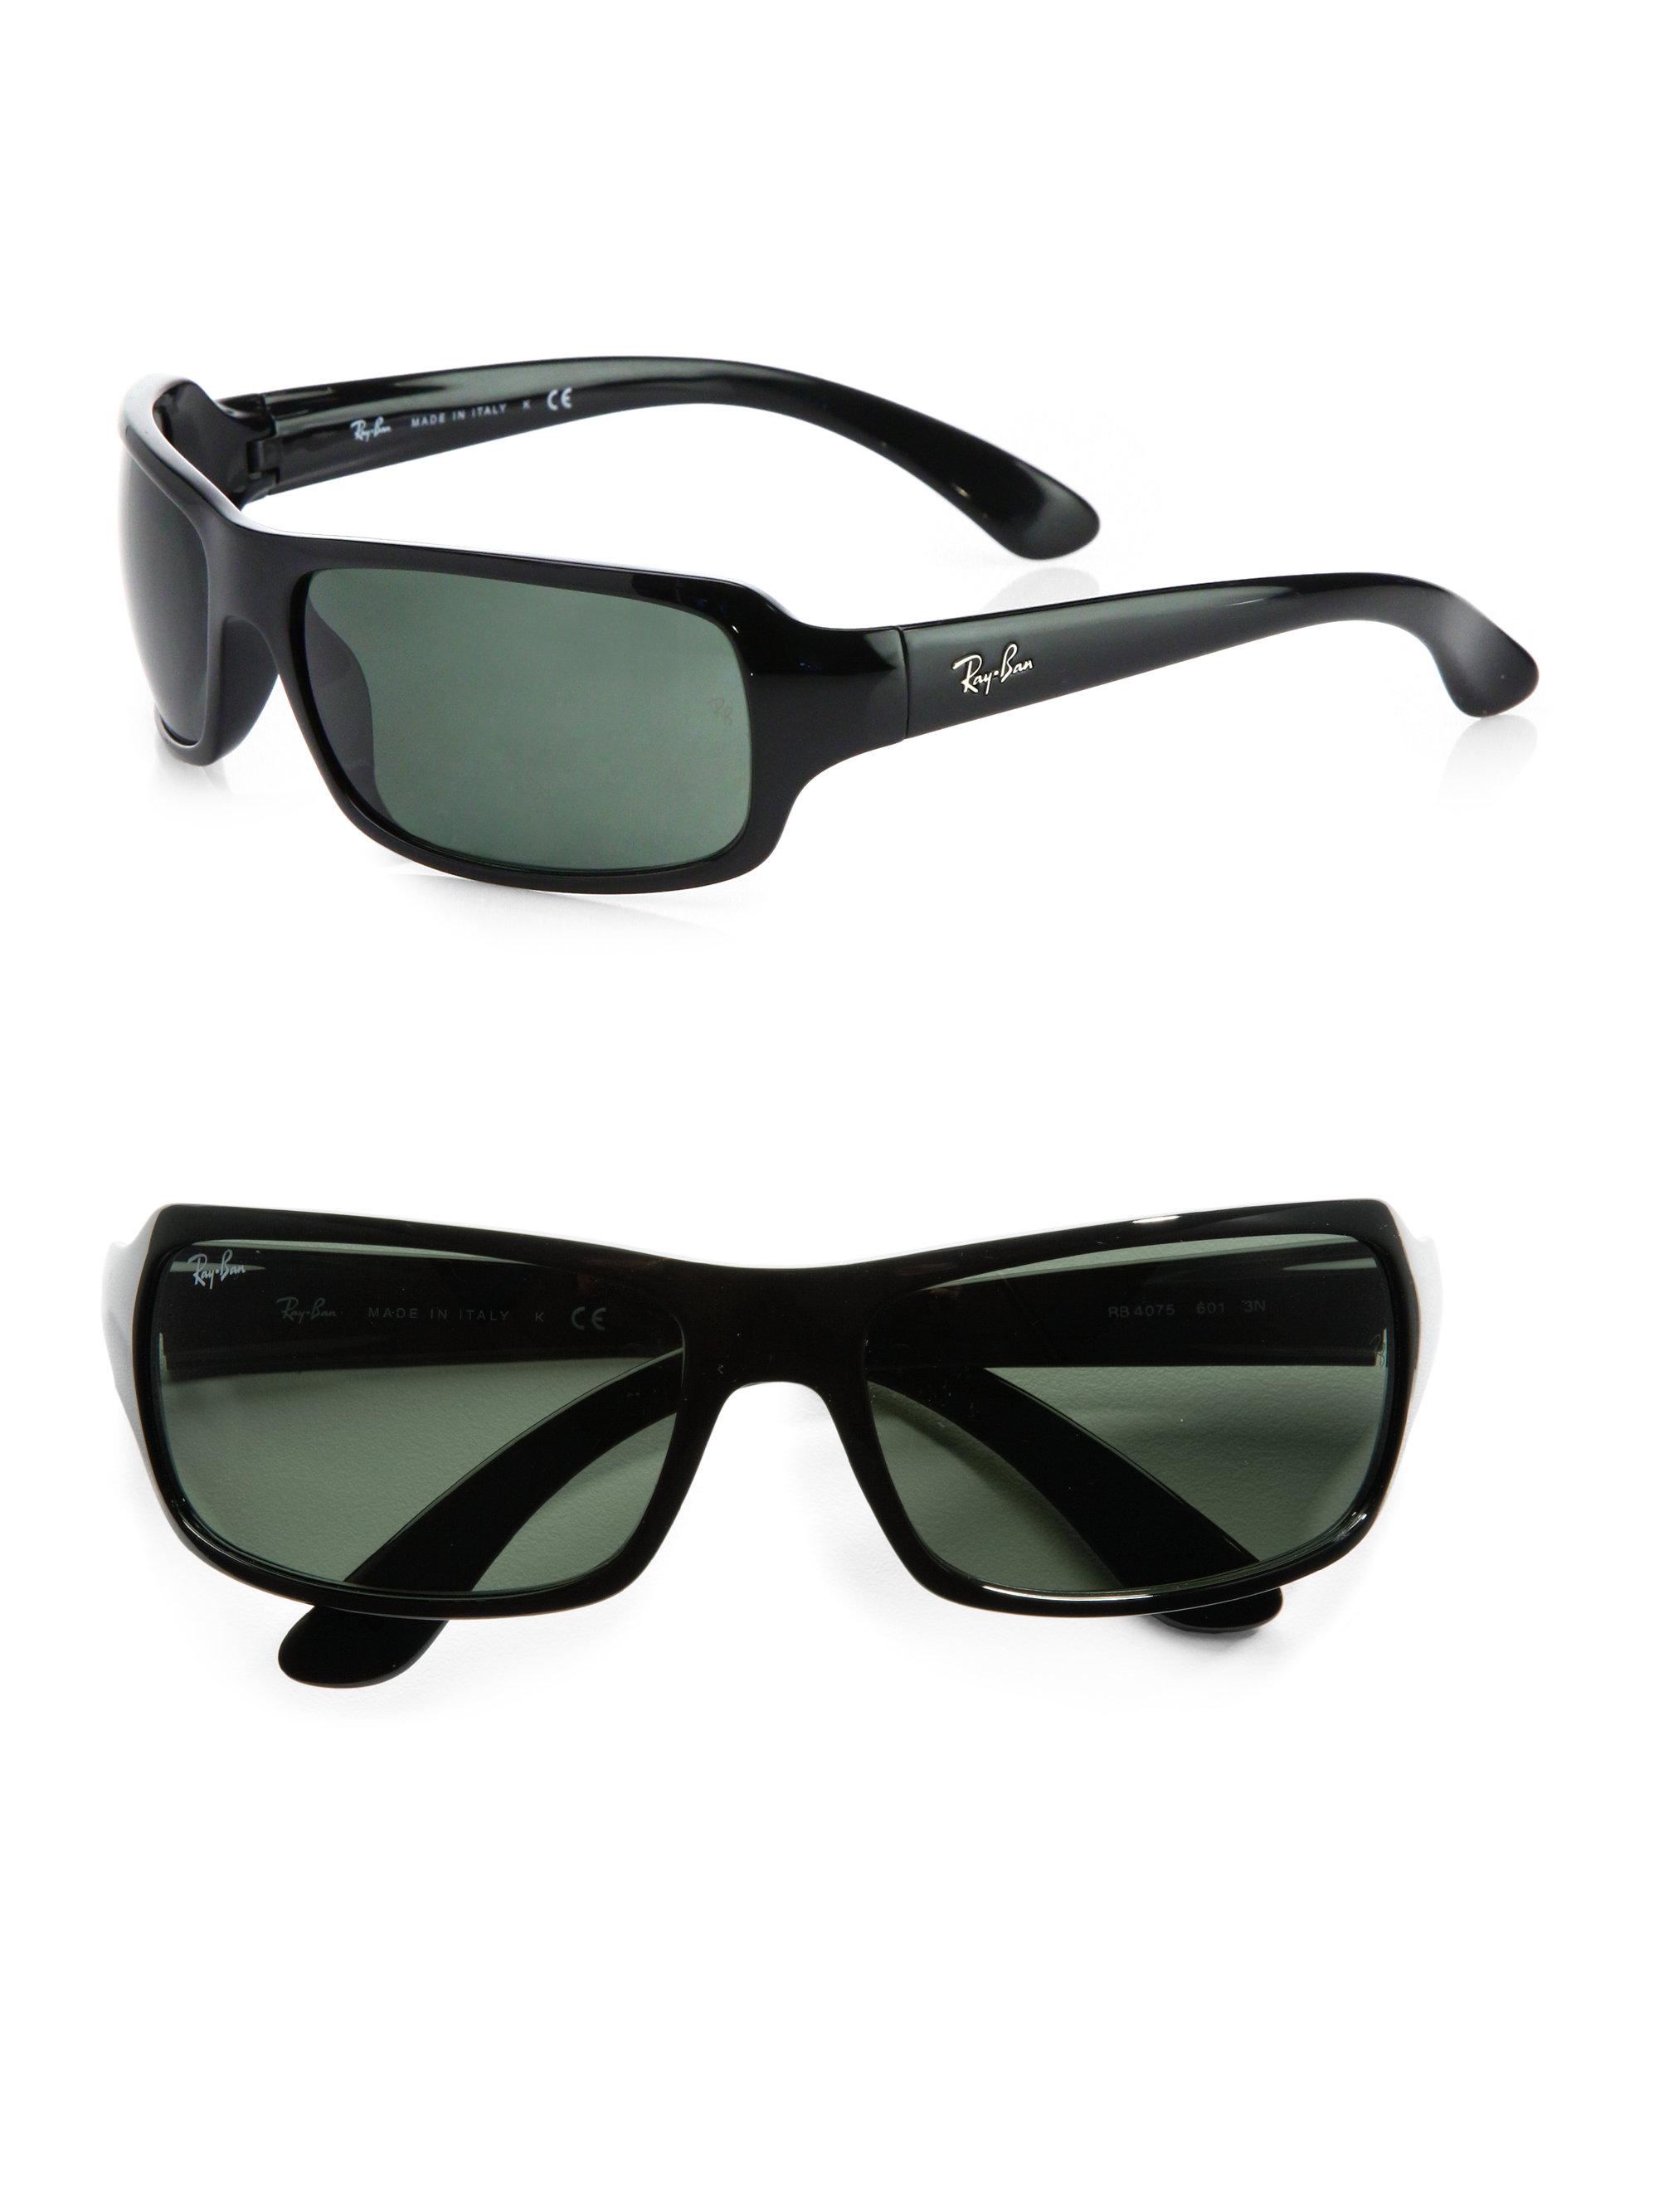 681c365bac3 Lyst - Ray-Ban Rectangular Wrap Sunglasses in Black for Men